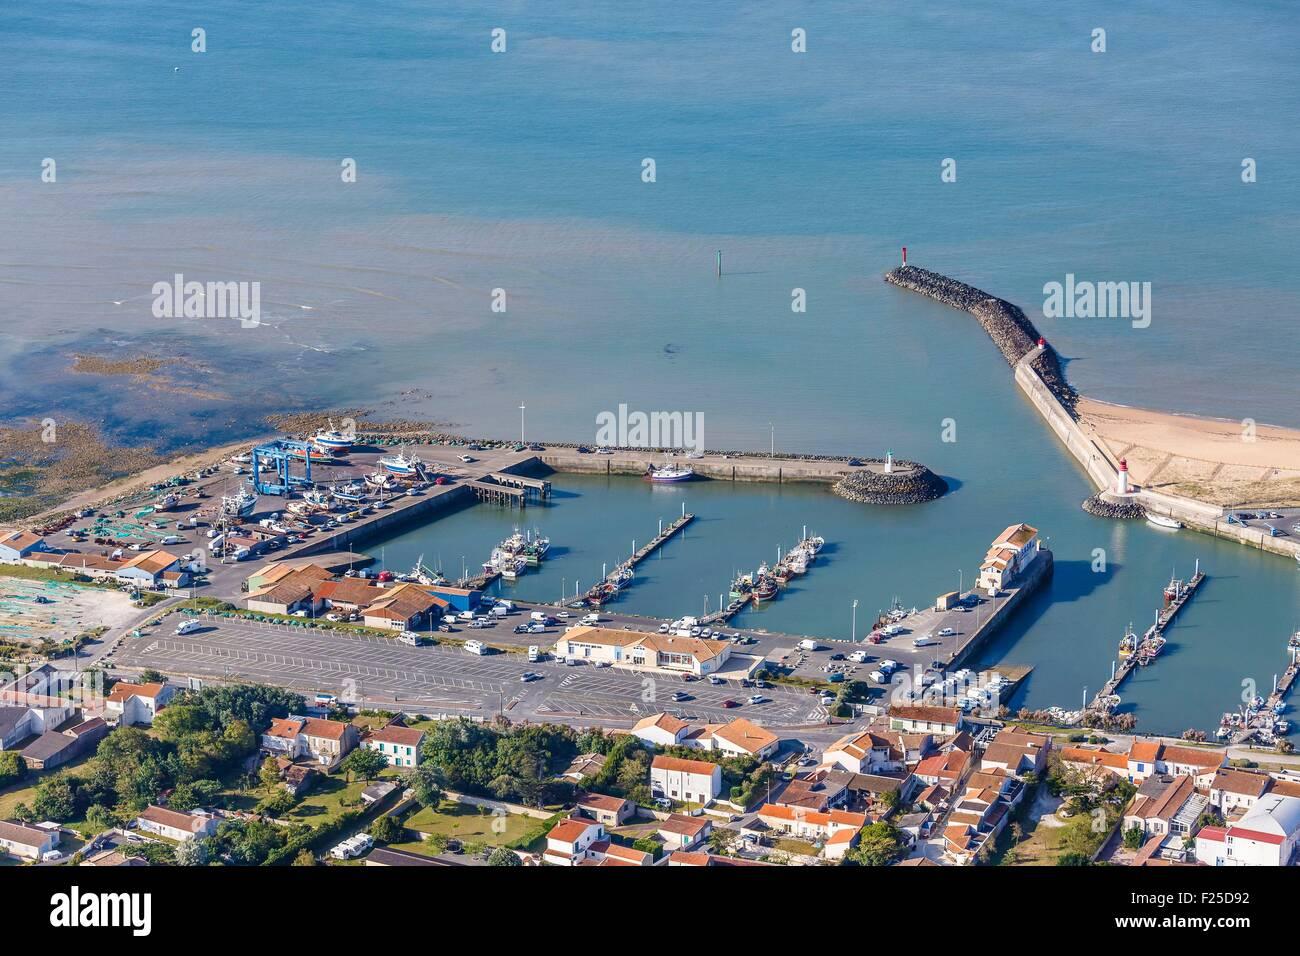 France, Charente Maritime, Saint Pierre d'Oleron, la Cotiniere fishing port (aerial view) - Stock Image